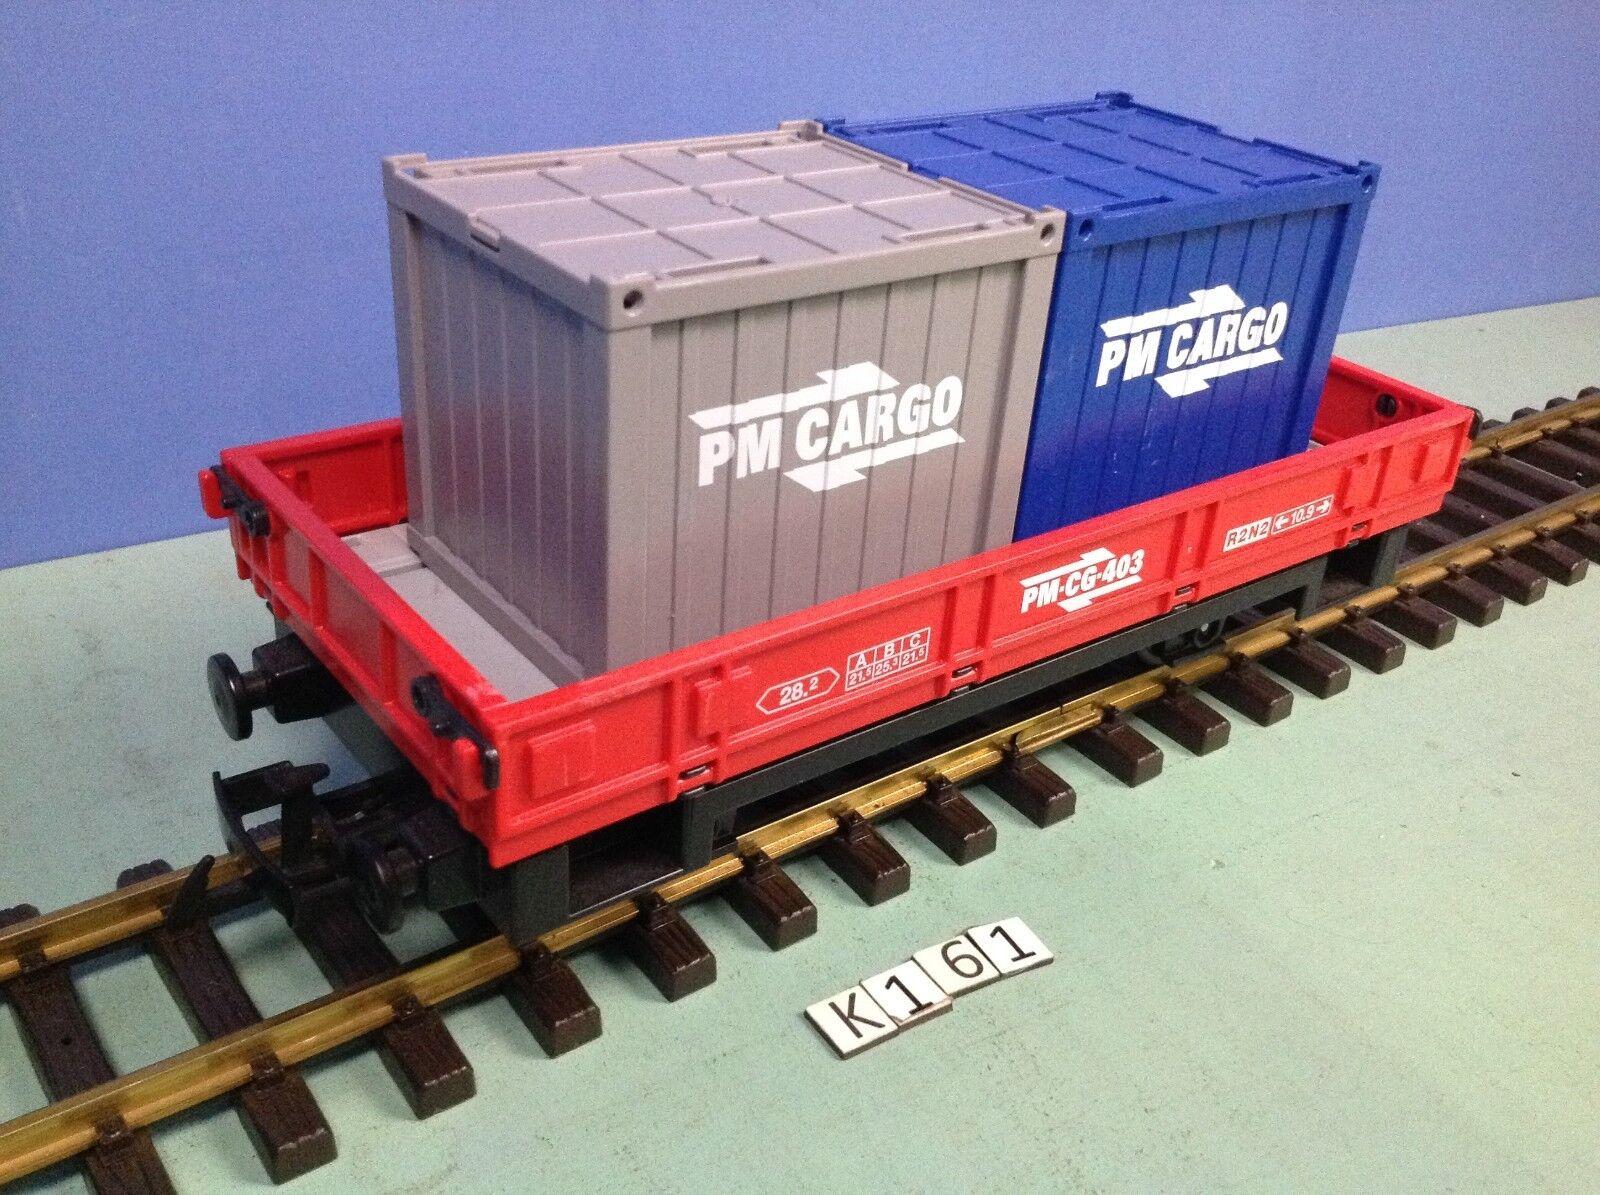 (K161) playmobil Wagon porte contener PM cargo rot ref 4126 train 5258